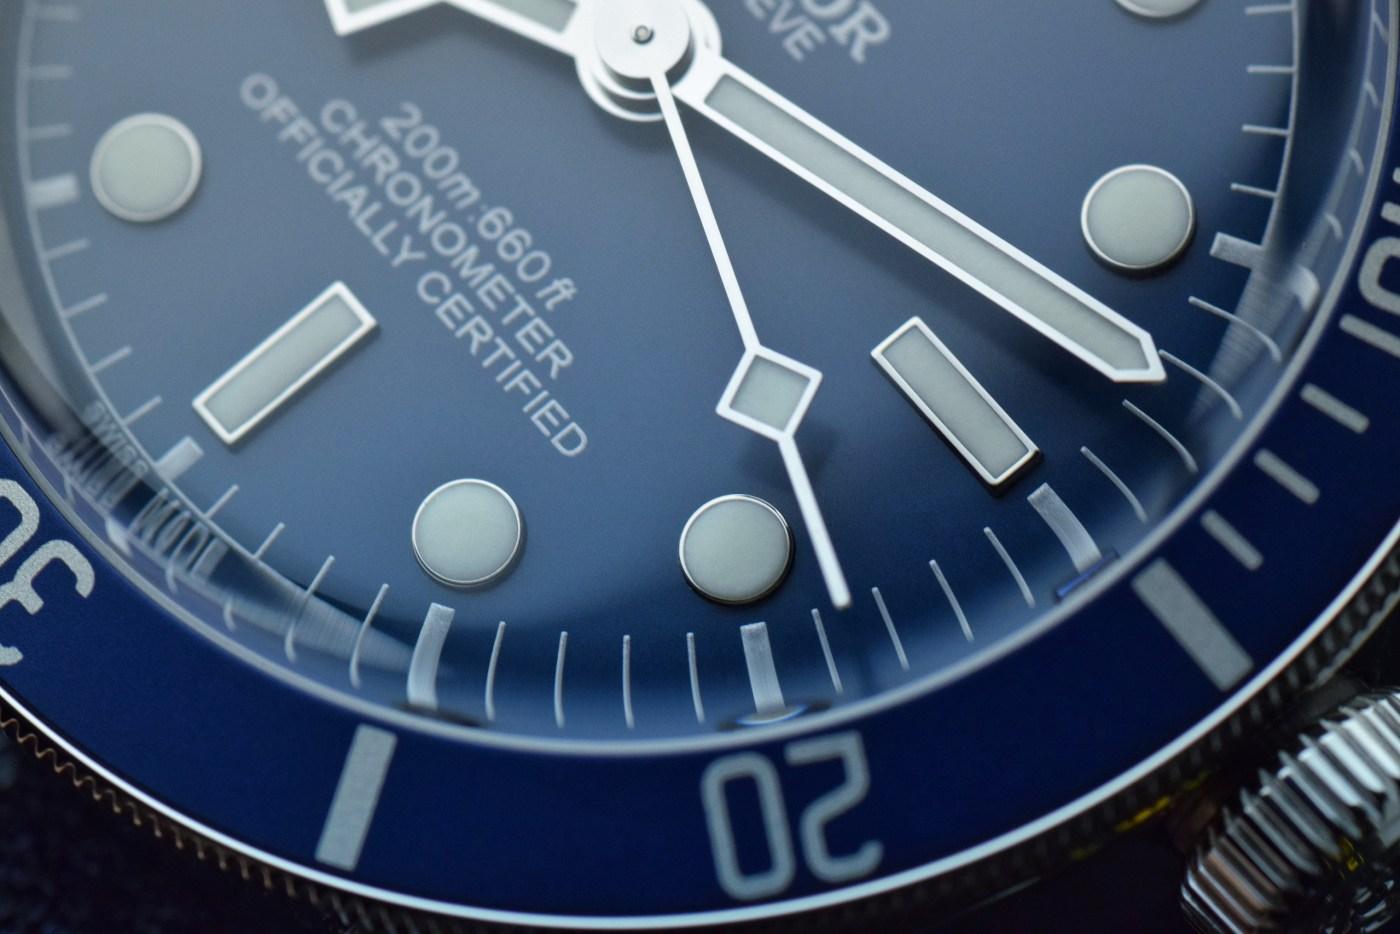 Tudor Black Bay Fifty-Eight Navy Blue Ref. 79030B dial